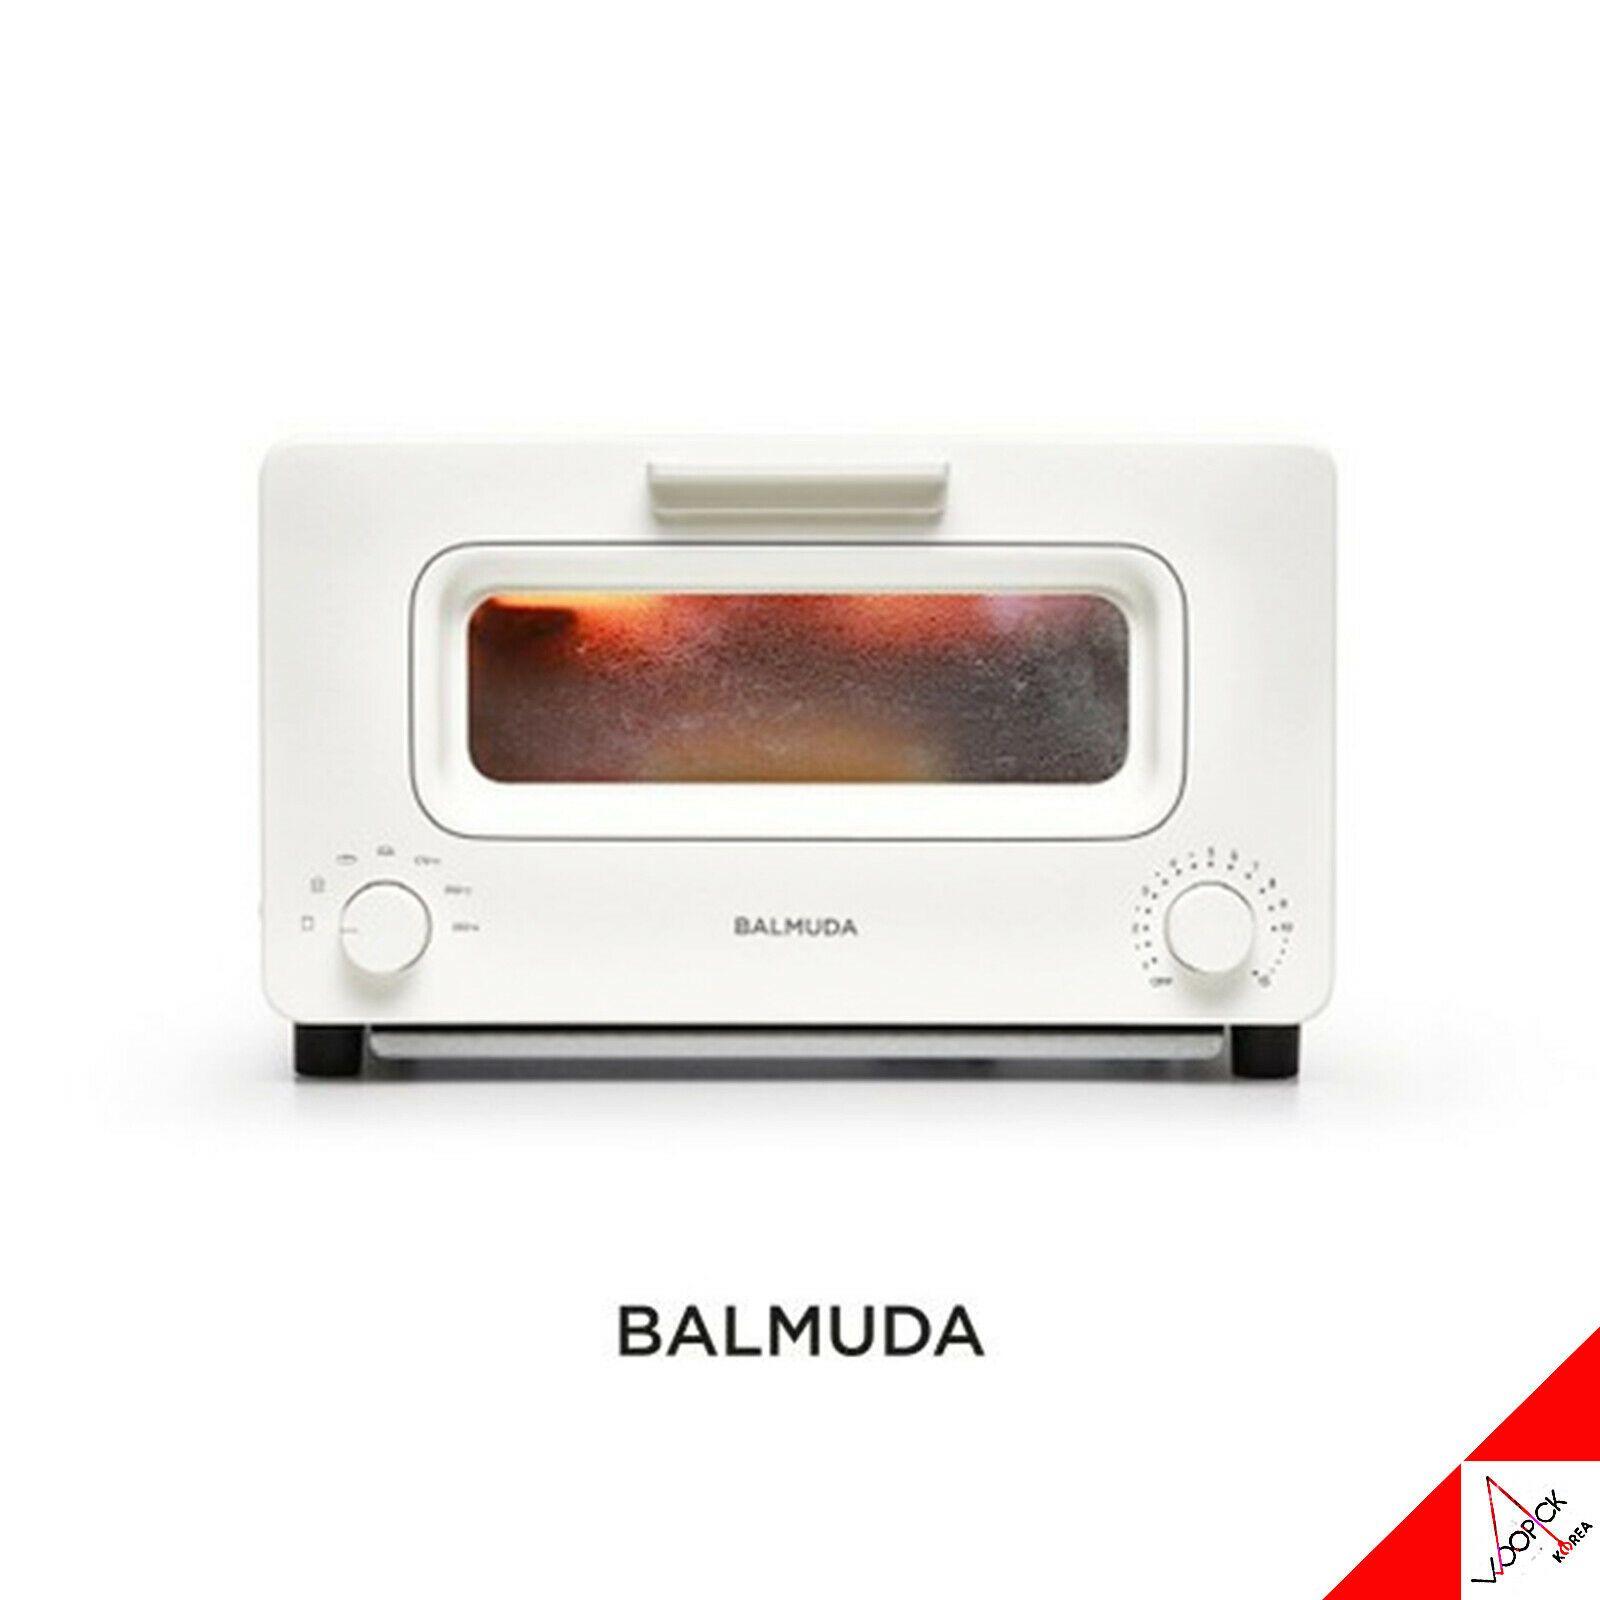 Balmuda The Toaster Premium Modern Classic K01k Ws White 220v Korean Ver In 2020 Toaster Modern Classic Cuisinart Toaster